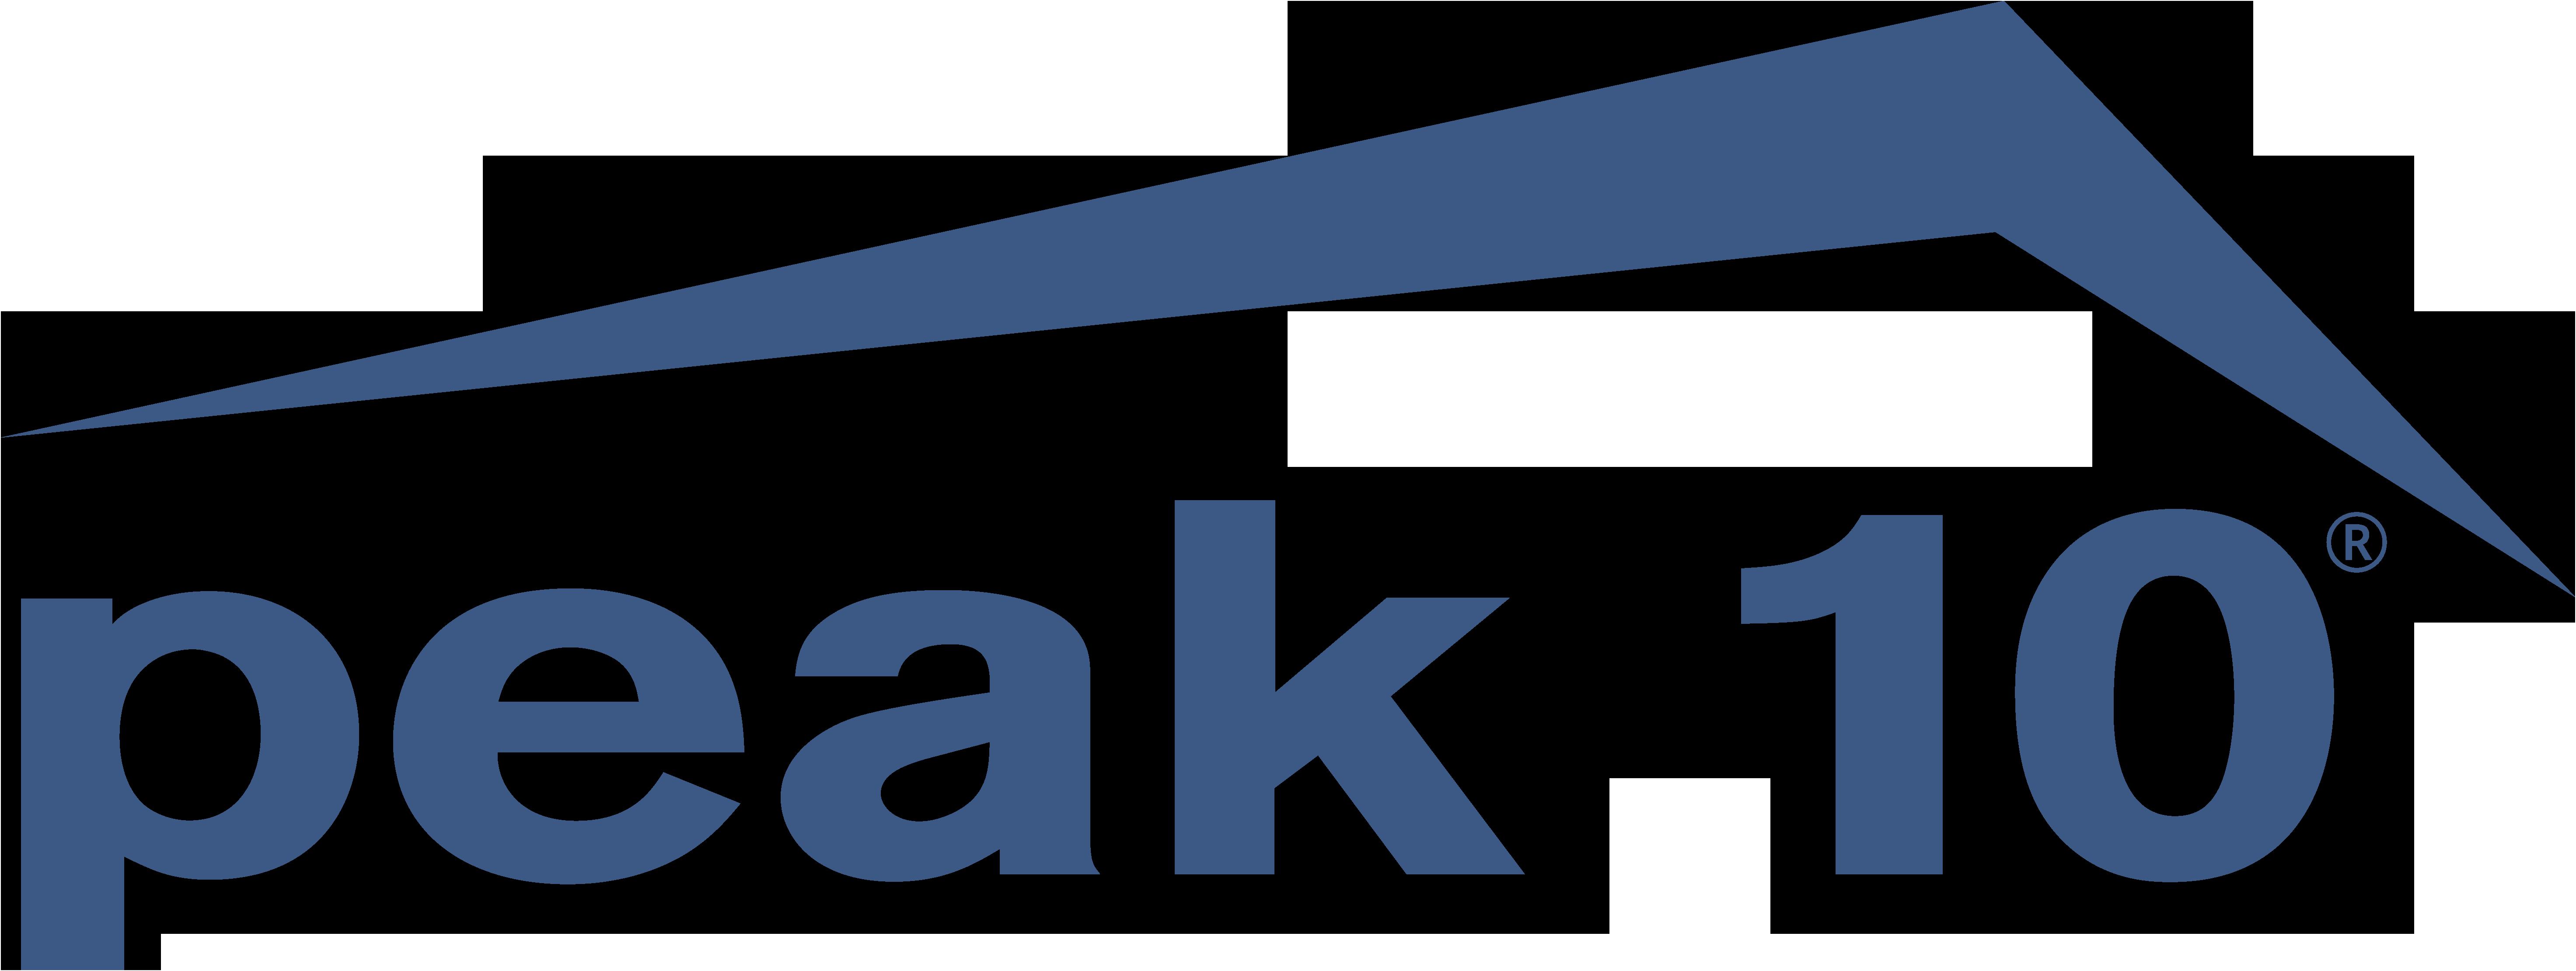 Peak10_Logo.png